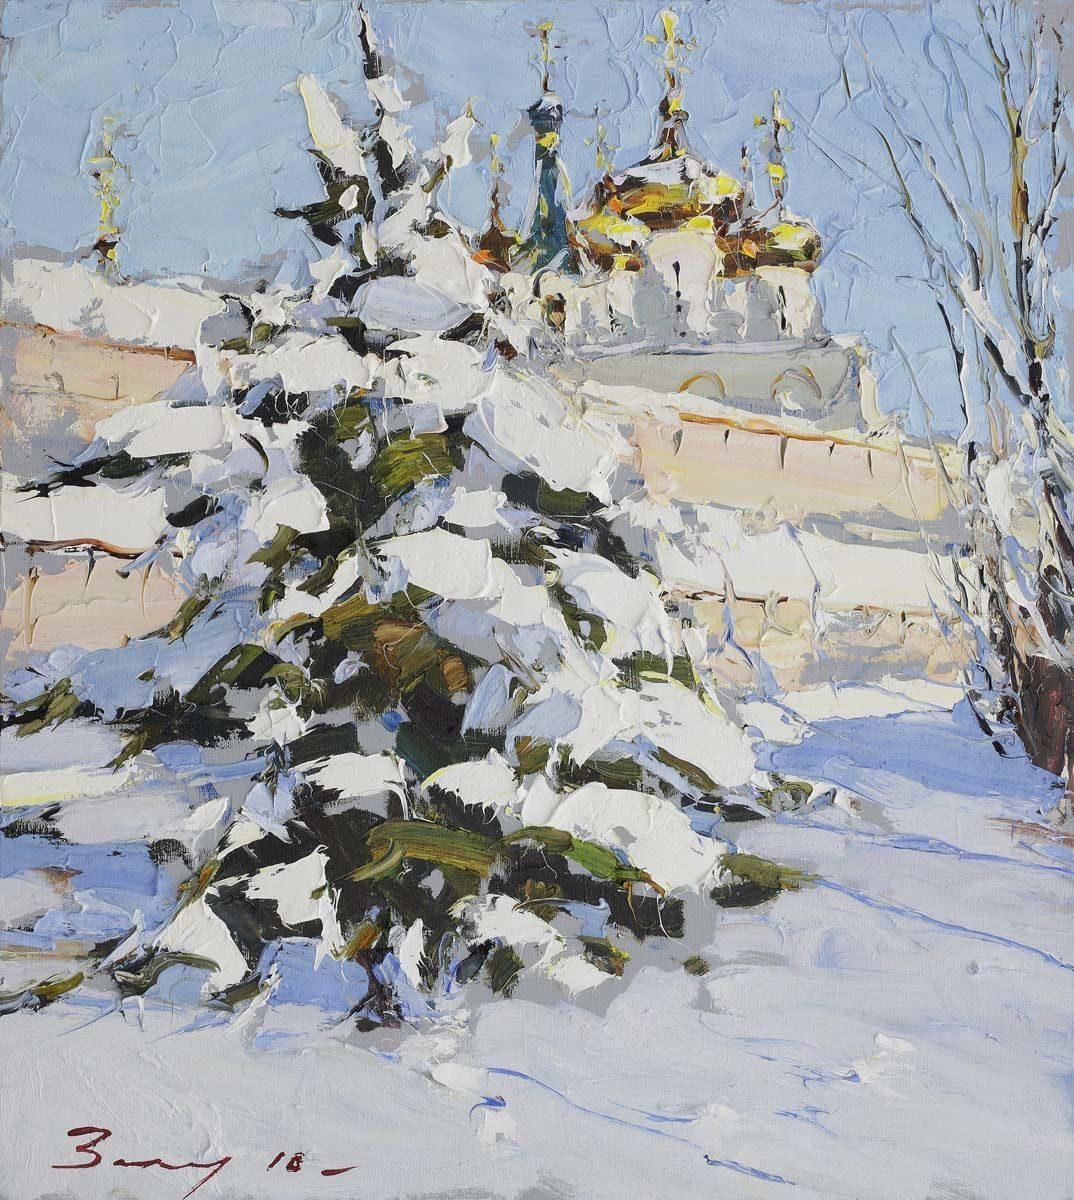 Андрей Захаров. Мороз и солнце, 2018